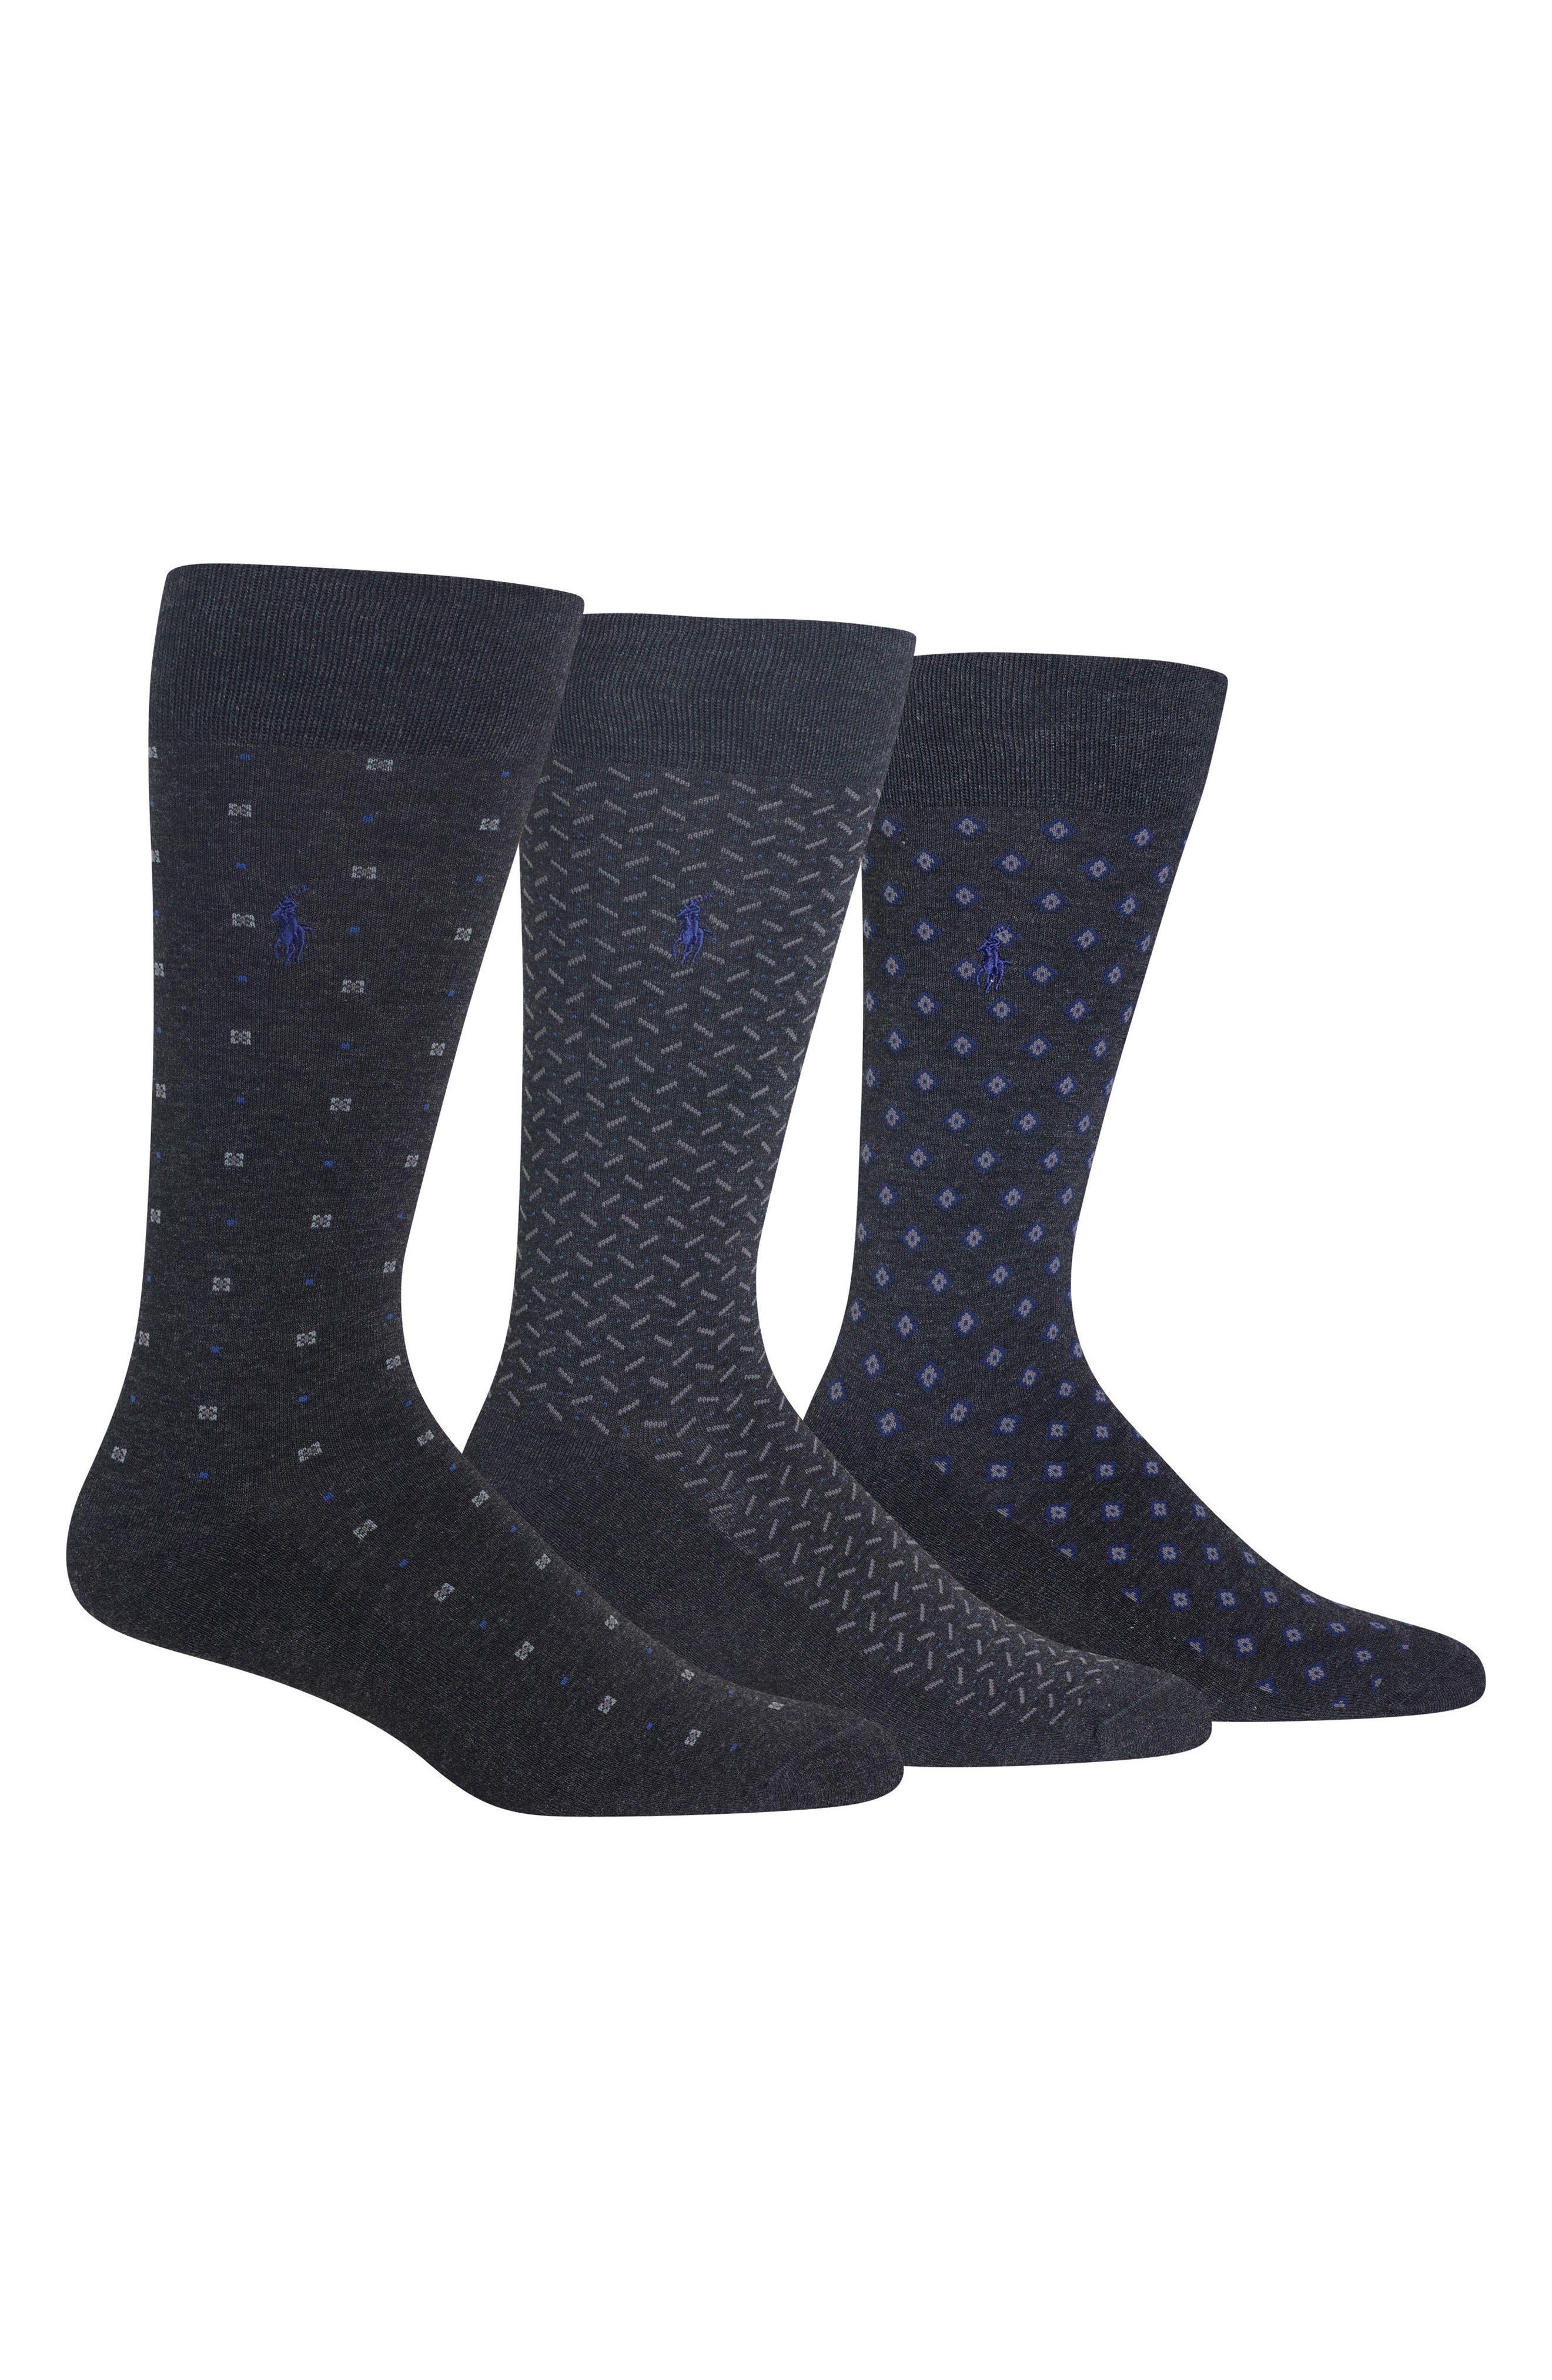 3-Pack Performance Socks,                         Main,                         color, 001